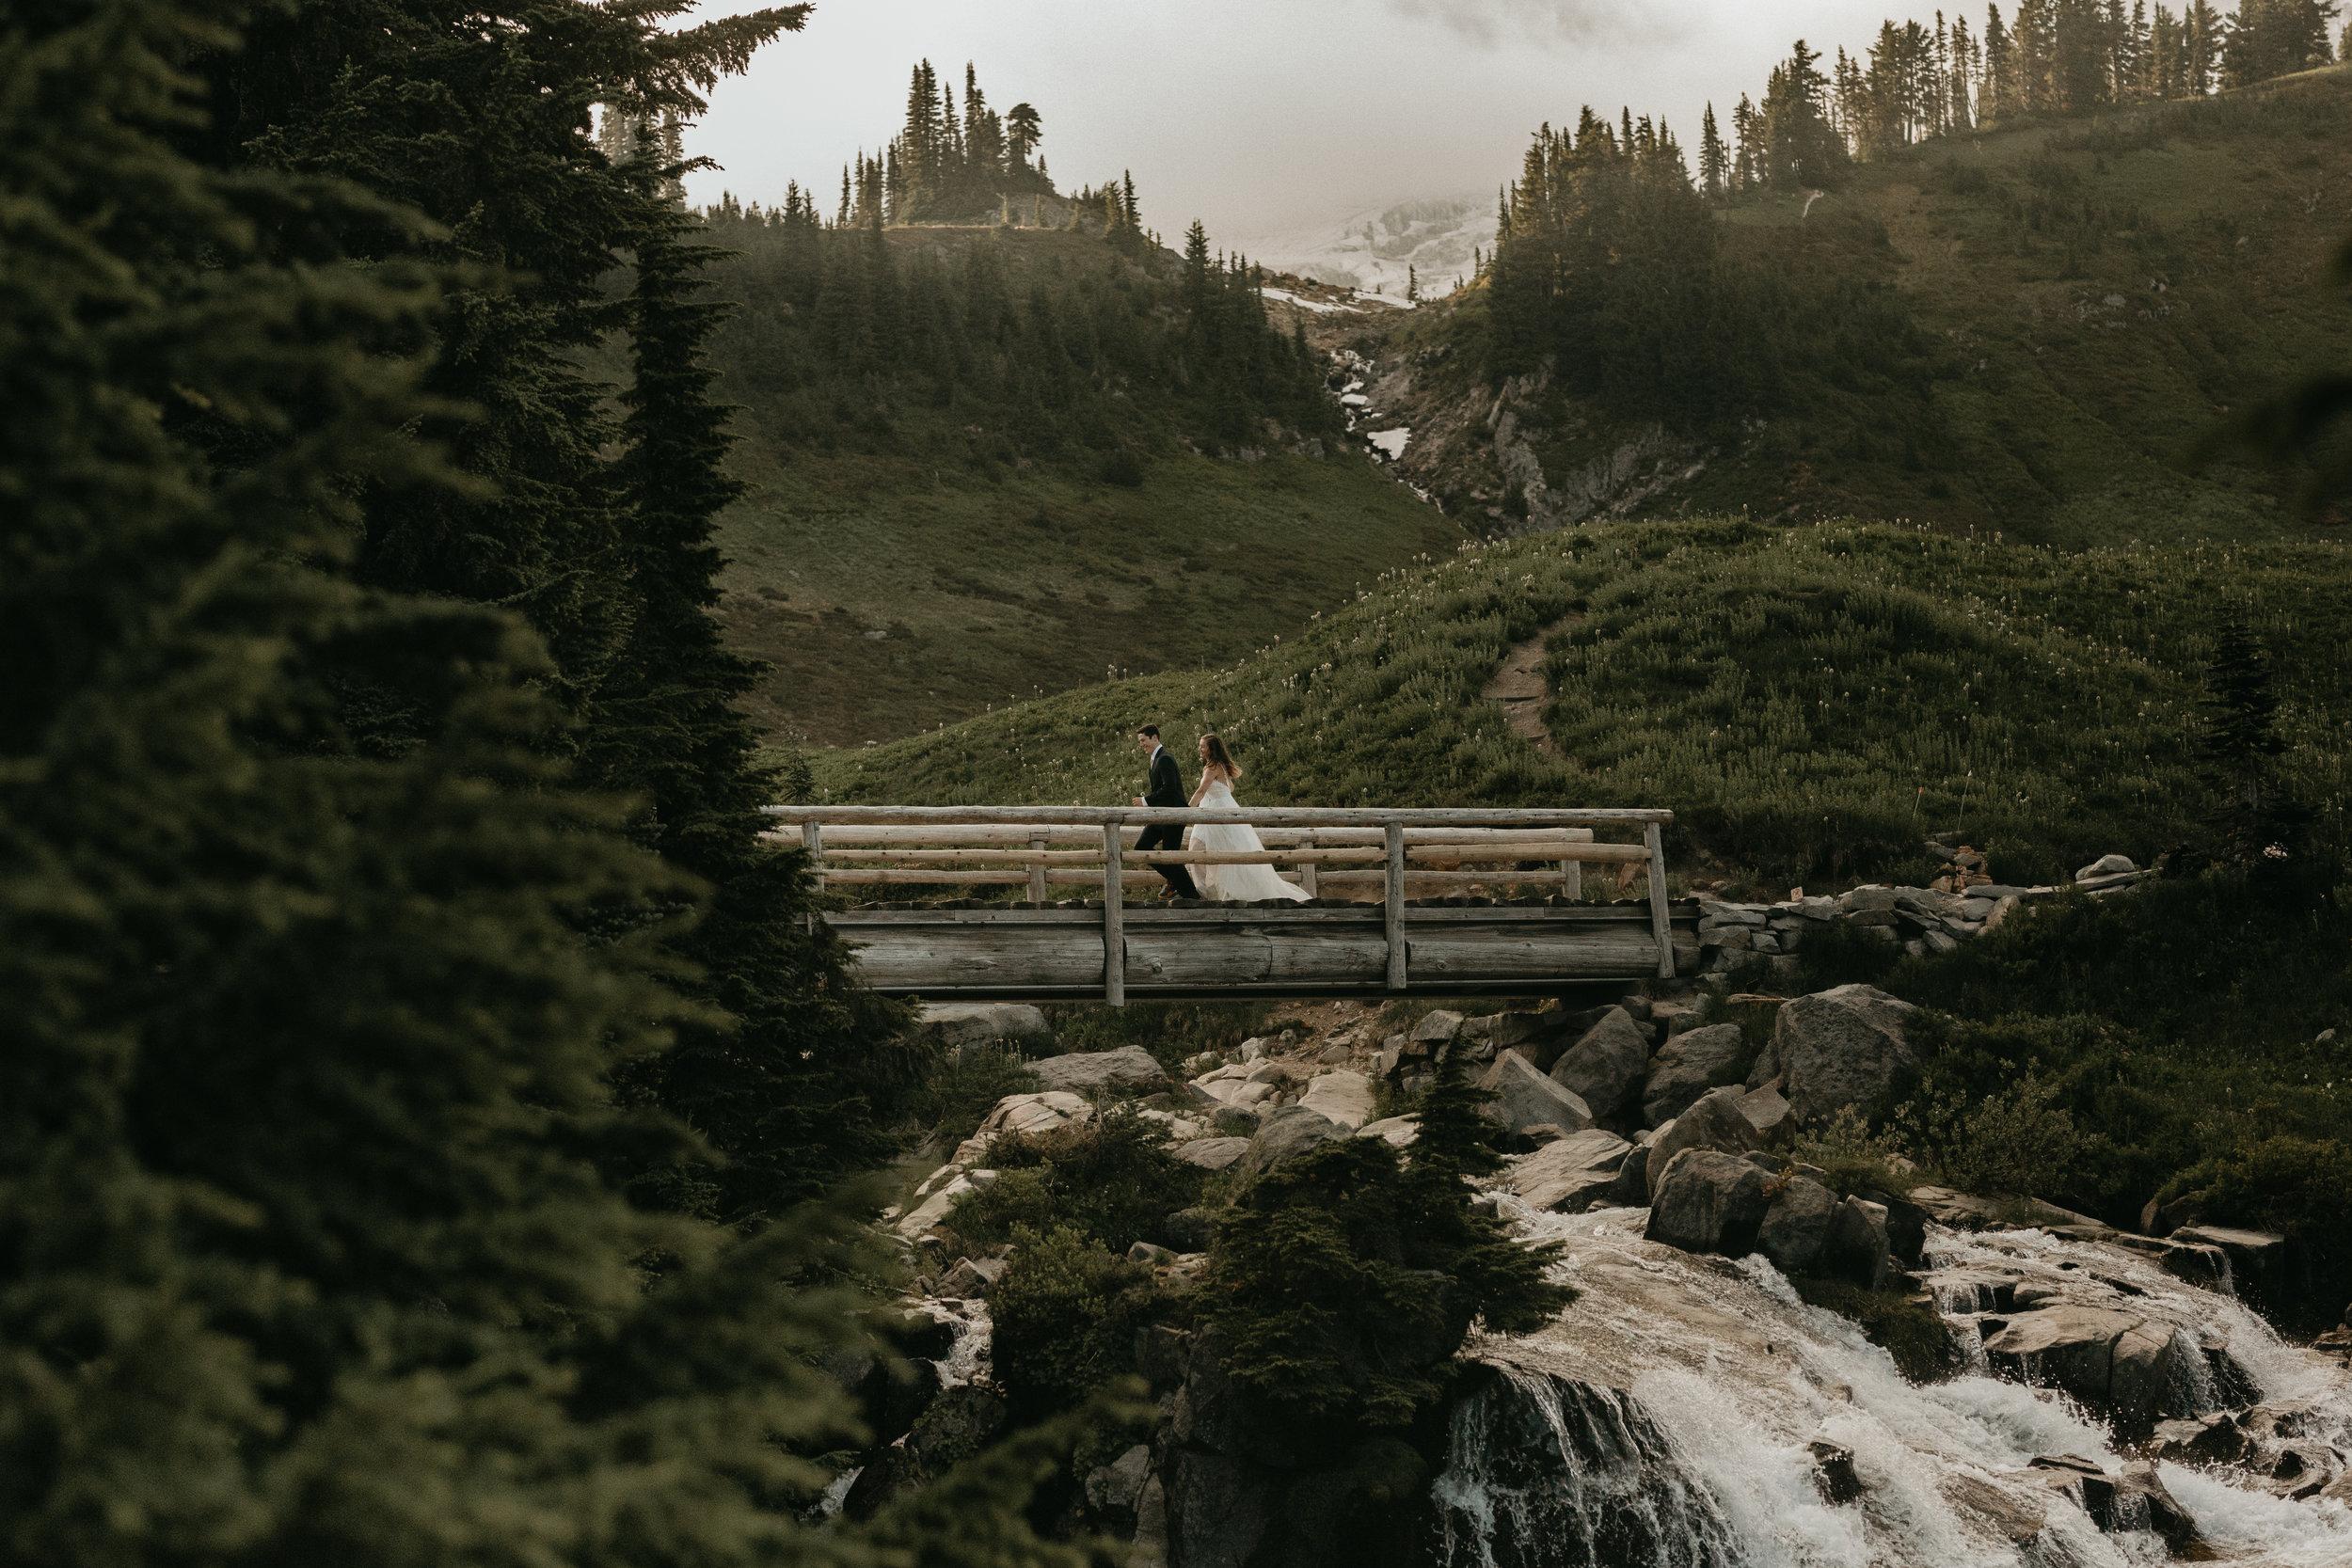 Nicole-Daacke-Photography-Mt-Rainier-elopement-photographer-washington-mountain-epic-wedding-photography-wildflowers-at-rainier-pine-tree-cloudy-summer-day-at-mountain-rainier-21.jpg